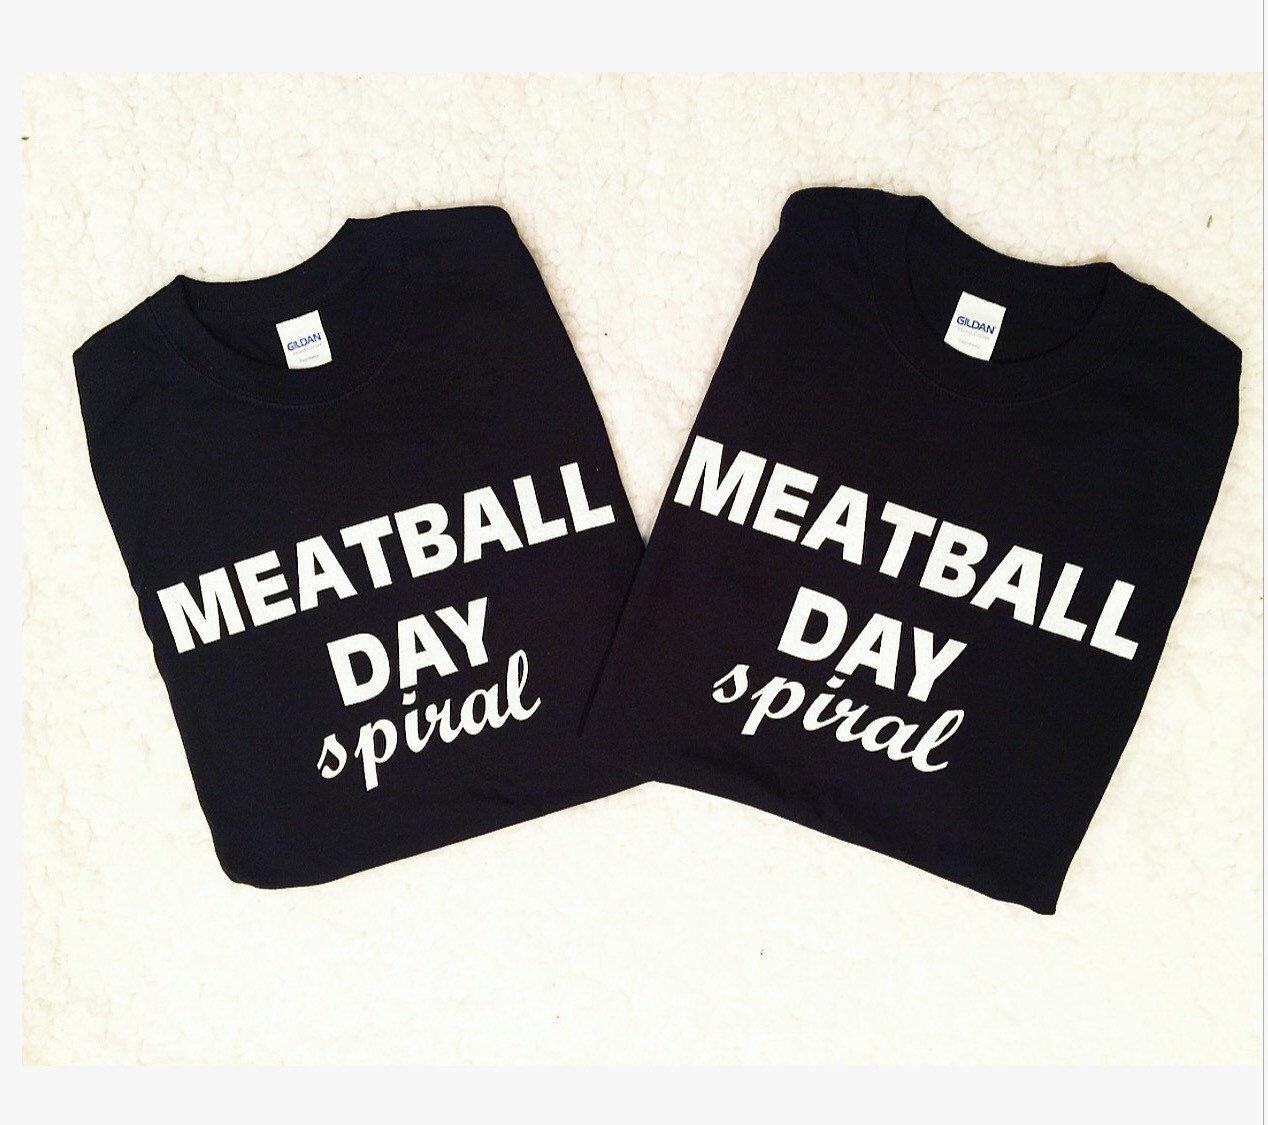 04461b3f9 Meatball Day Shirts Jersey Shore Shirts. gallery photo